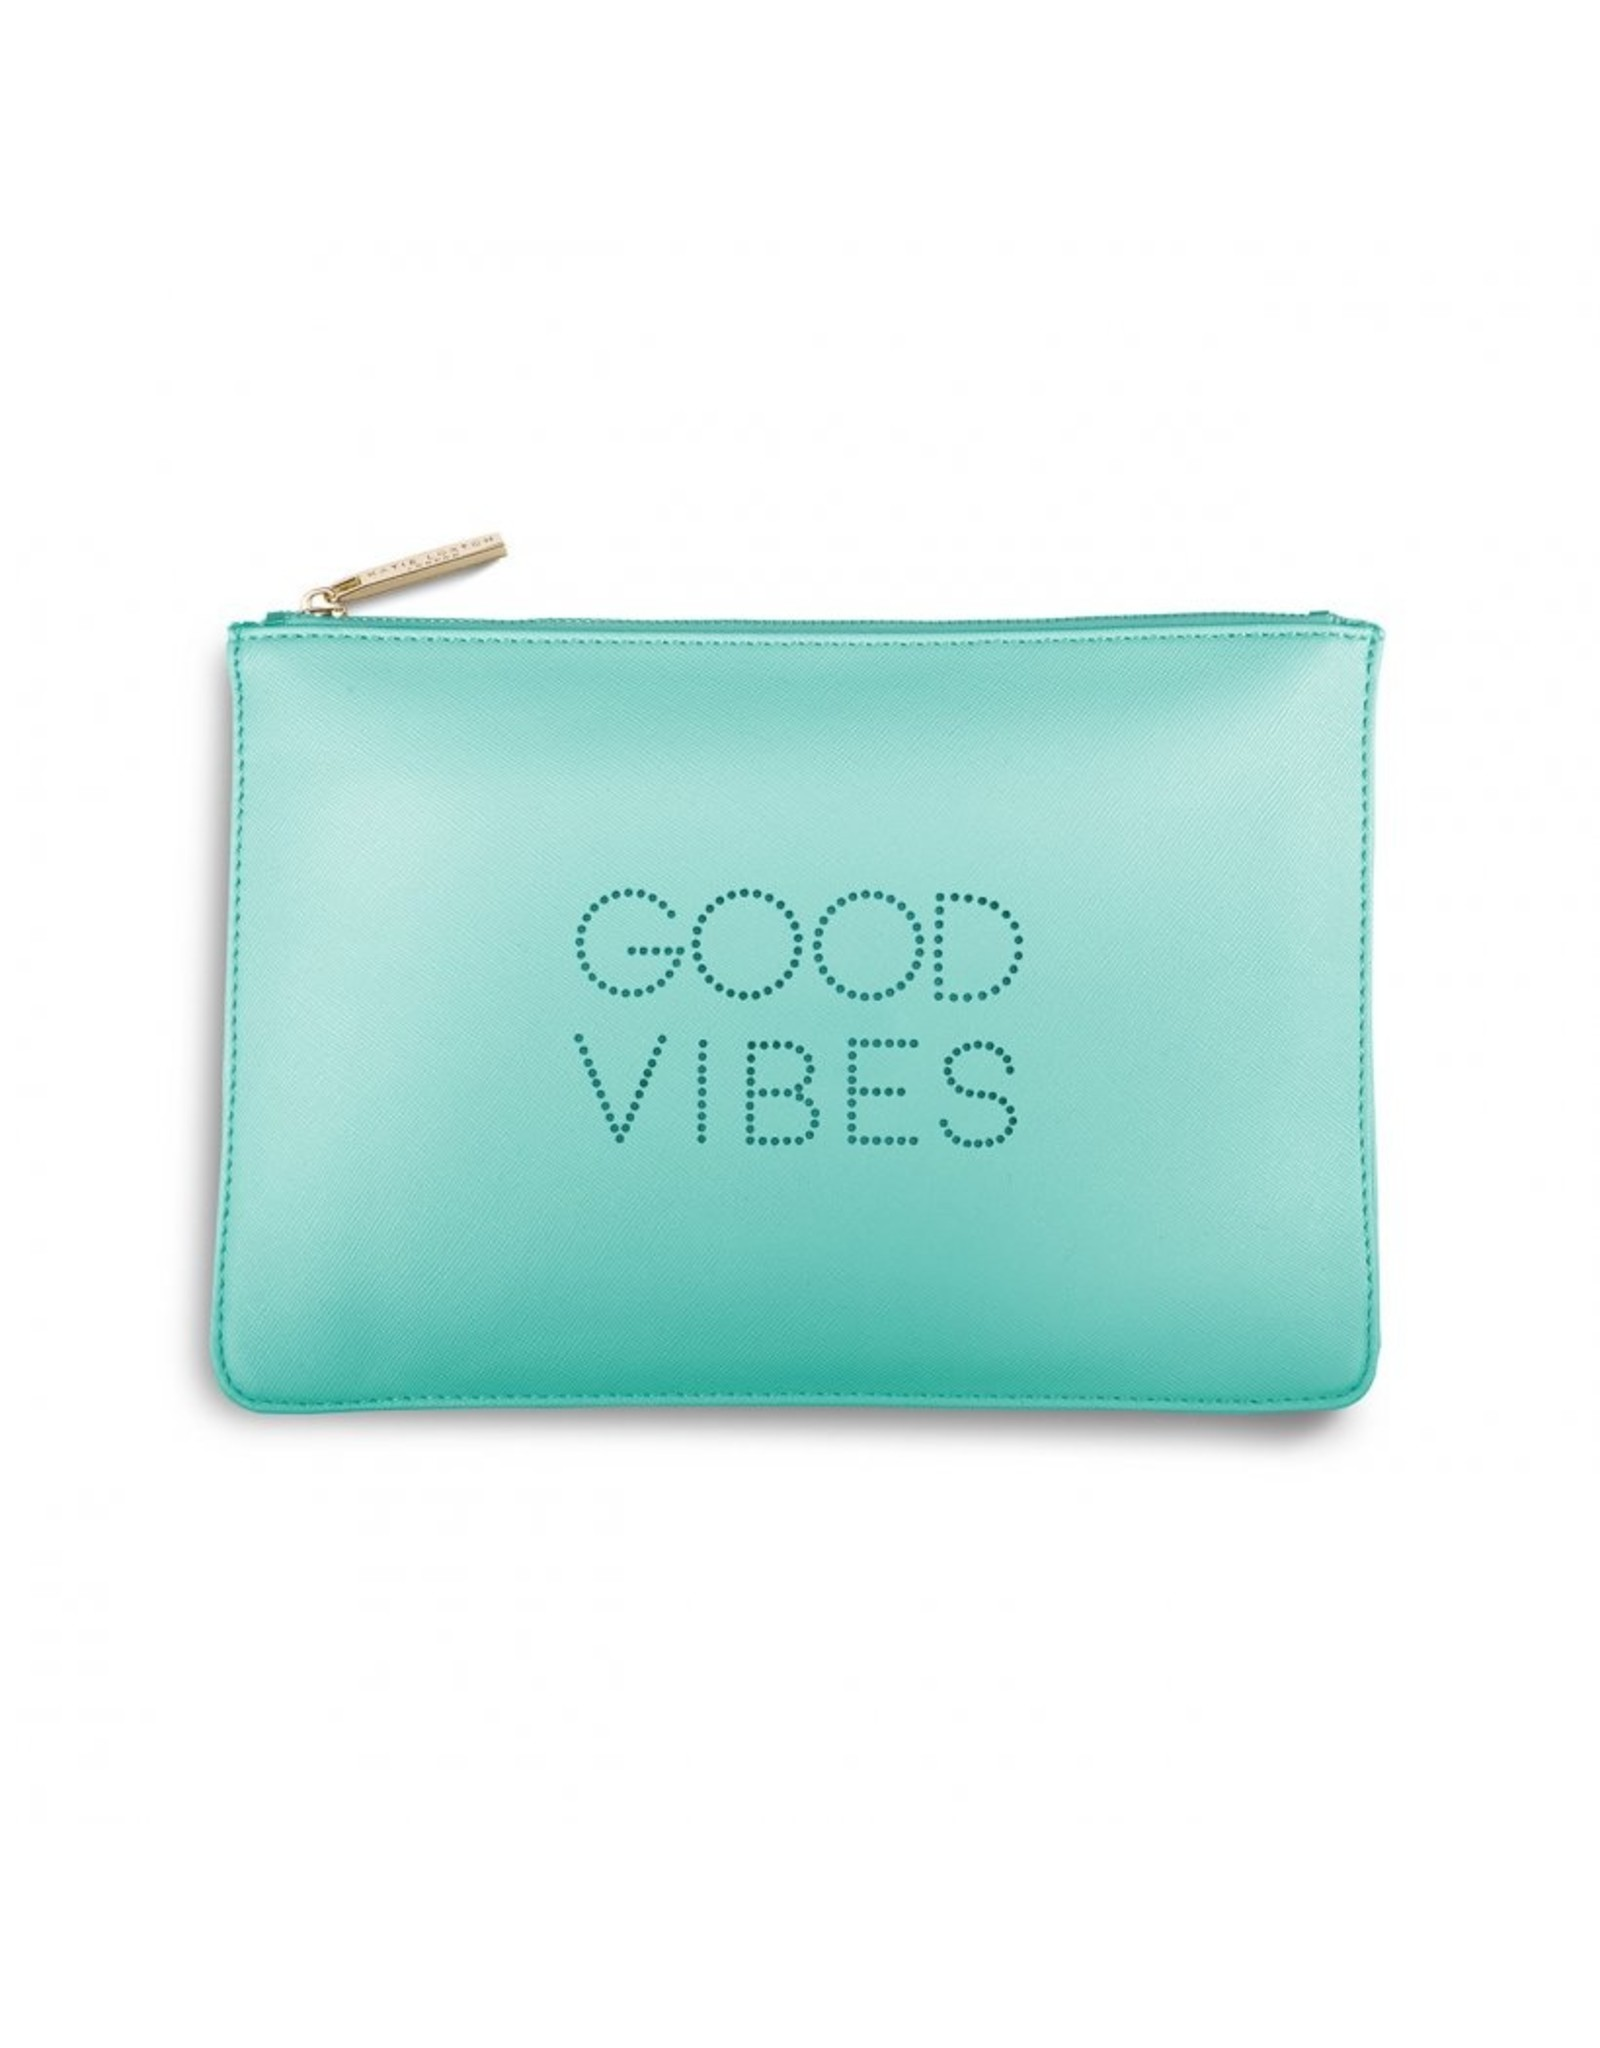 Katie Loxton Pochette - Good Vibes